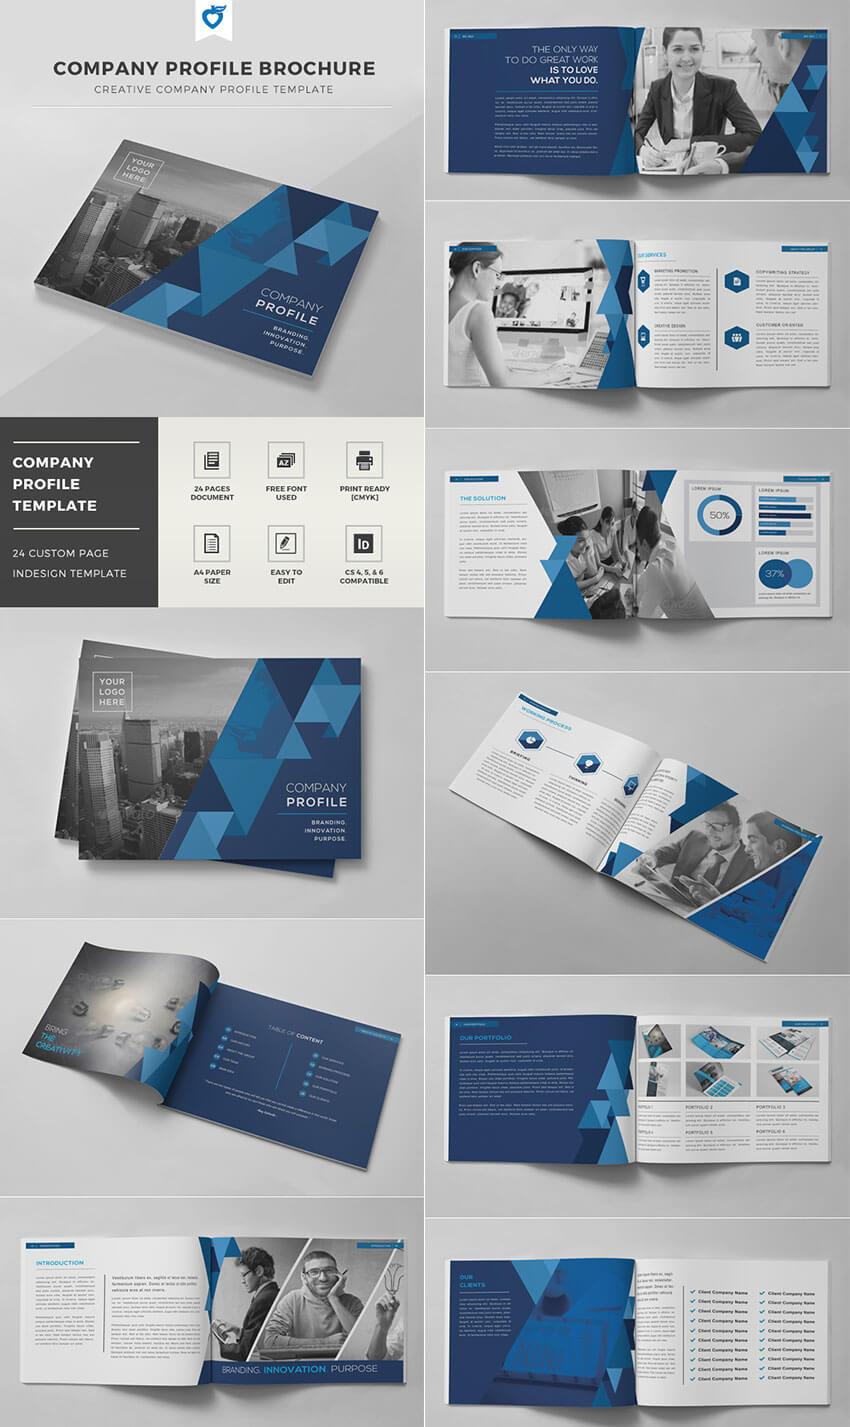 30 Best Indesign Brochure Templates - Creative Business In Adobe Indesign Brochure Templates